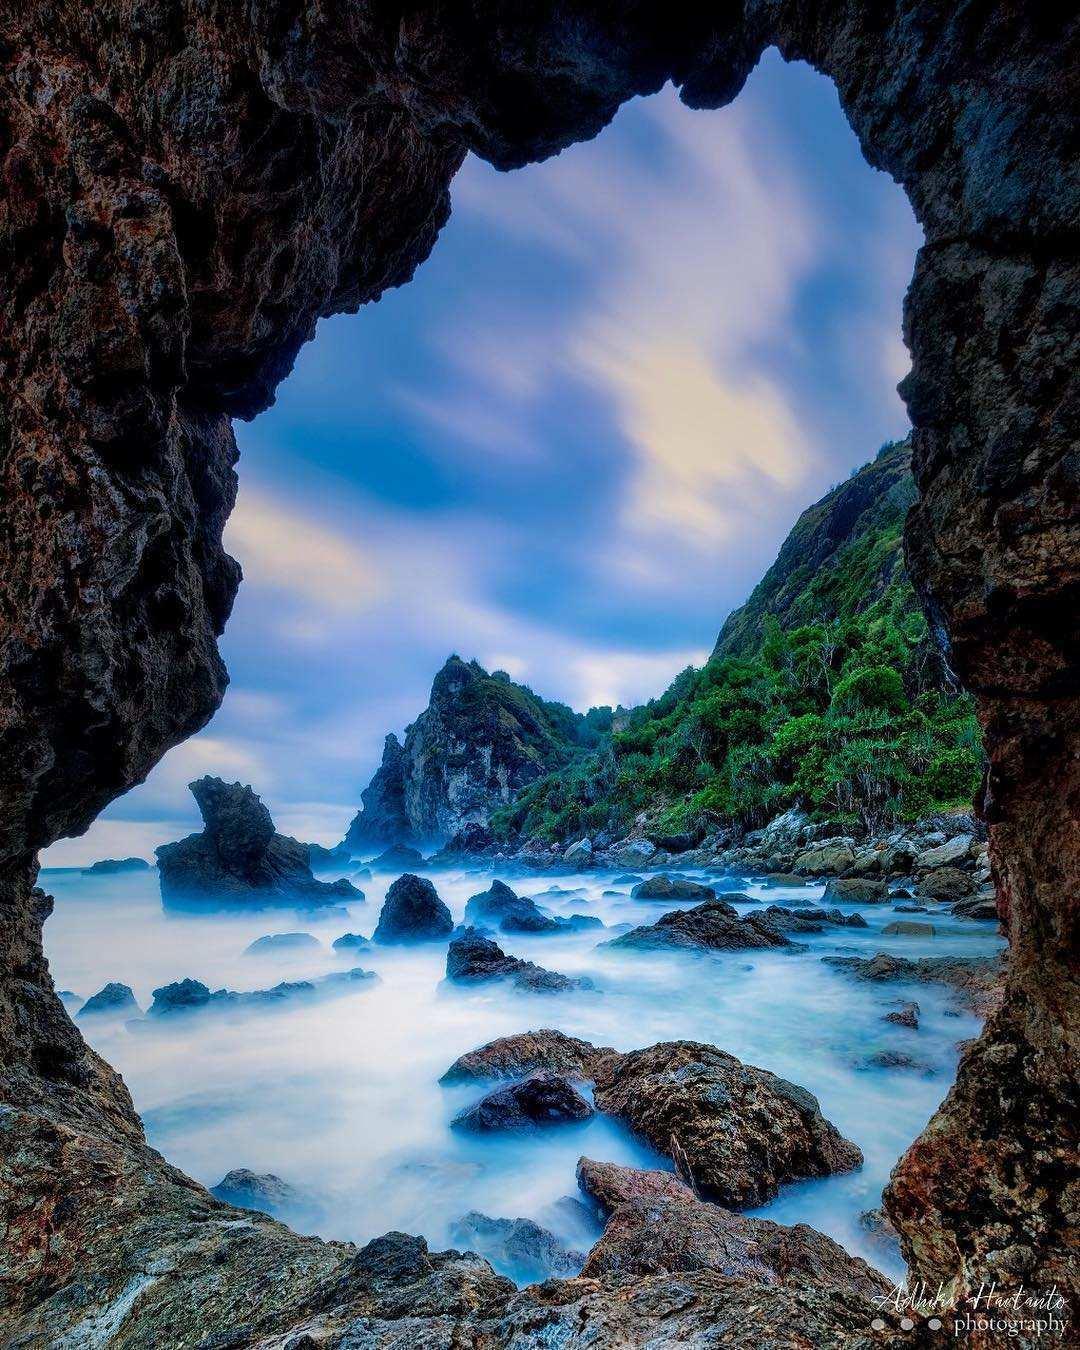 Batu Berlubang di Pantai Watu Lumbung, Images From @adhika_captures